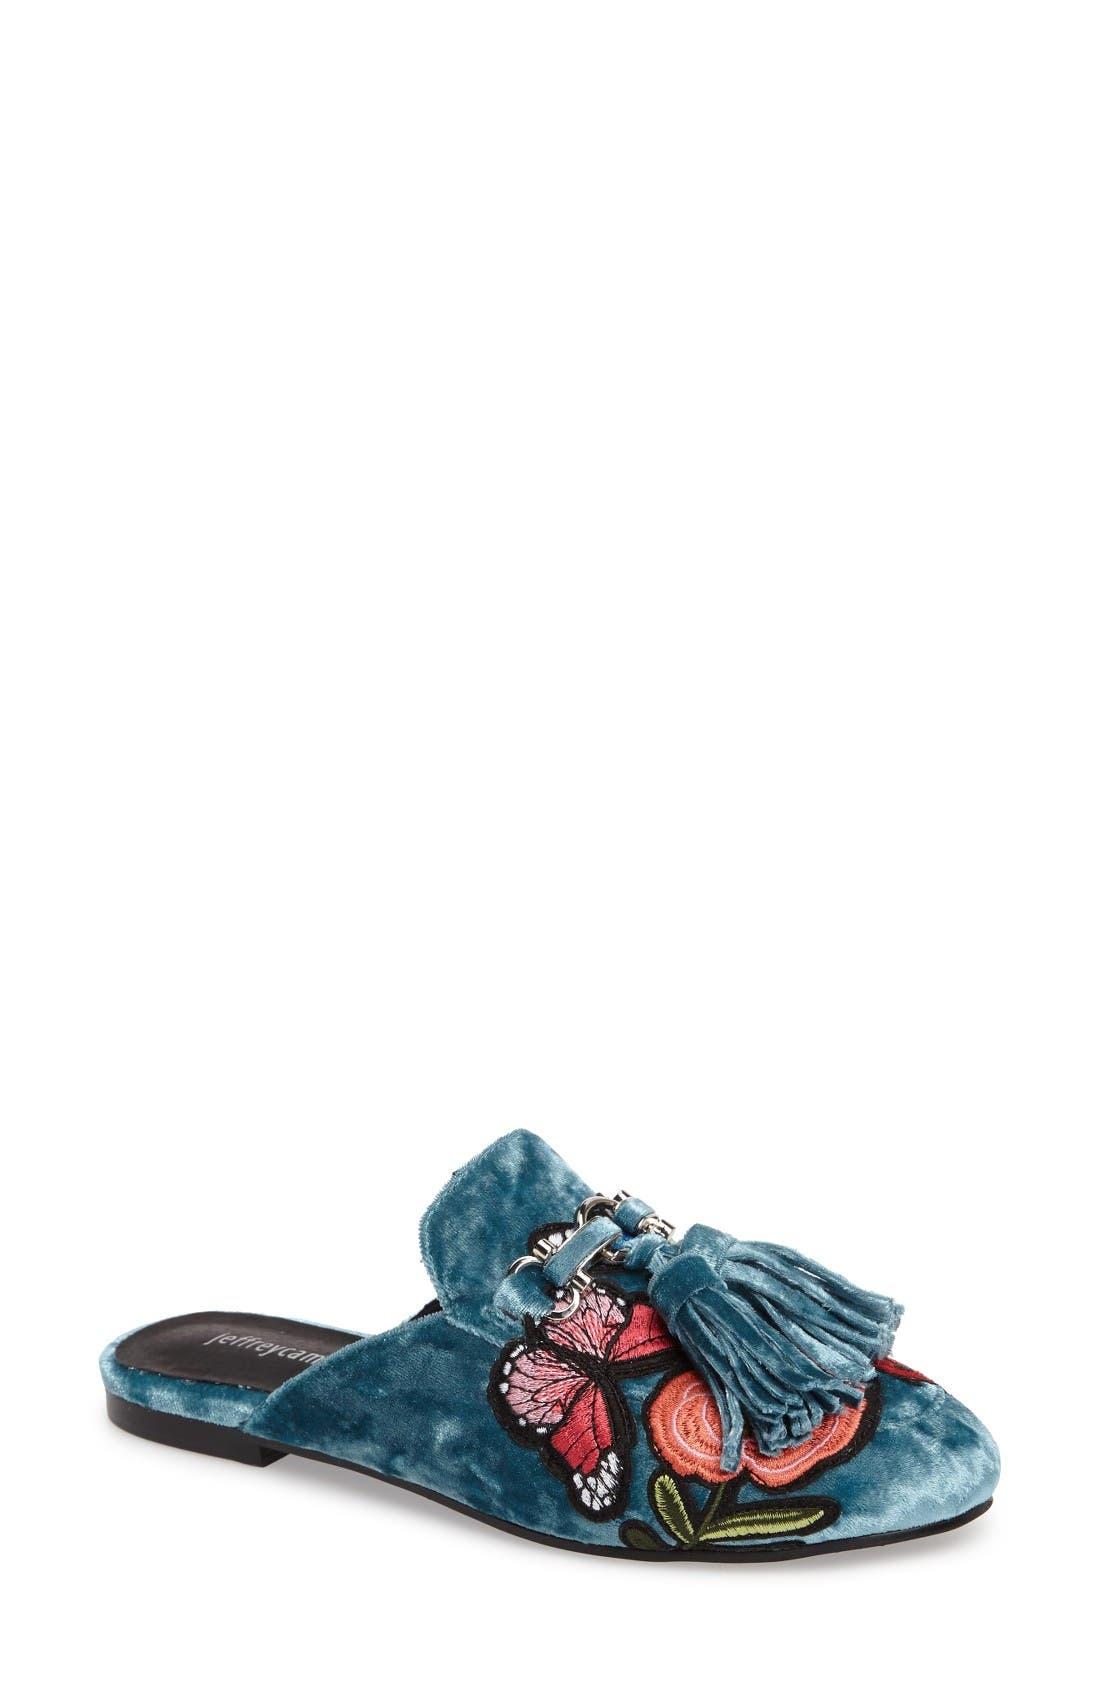 Alternate Image 1 Selected - Jeffrey Campbell Apfel Flower Tassel Loafer Mule (Women)